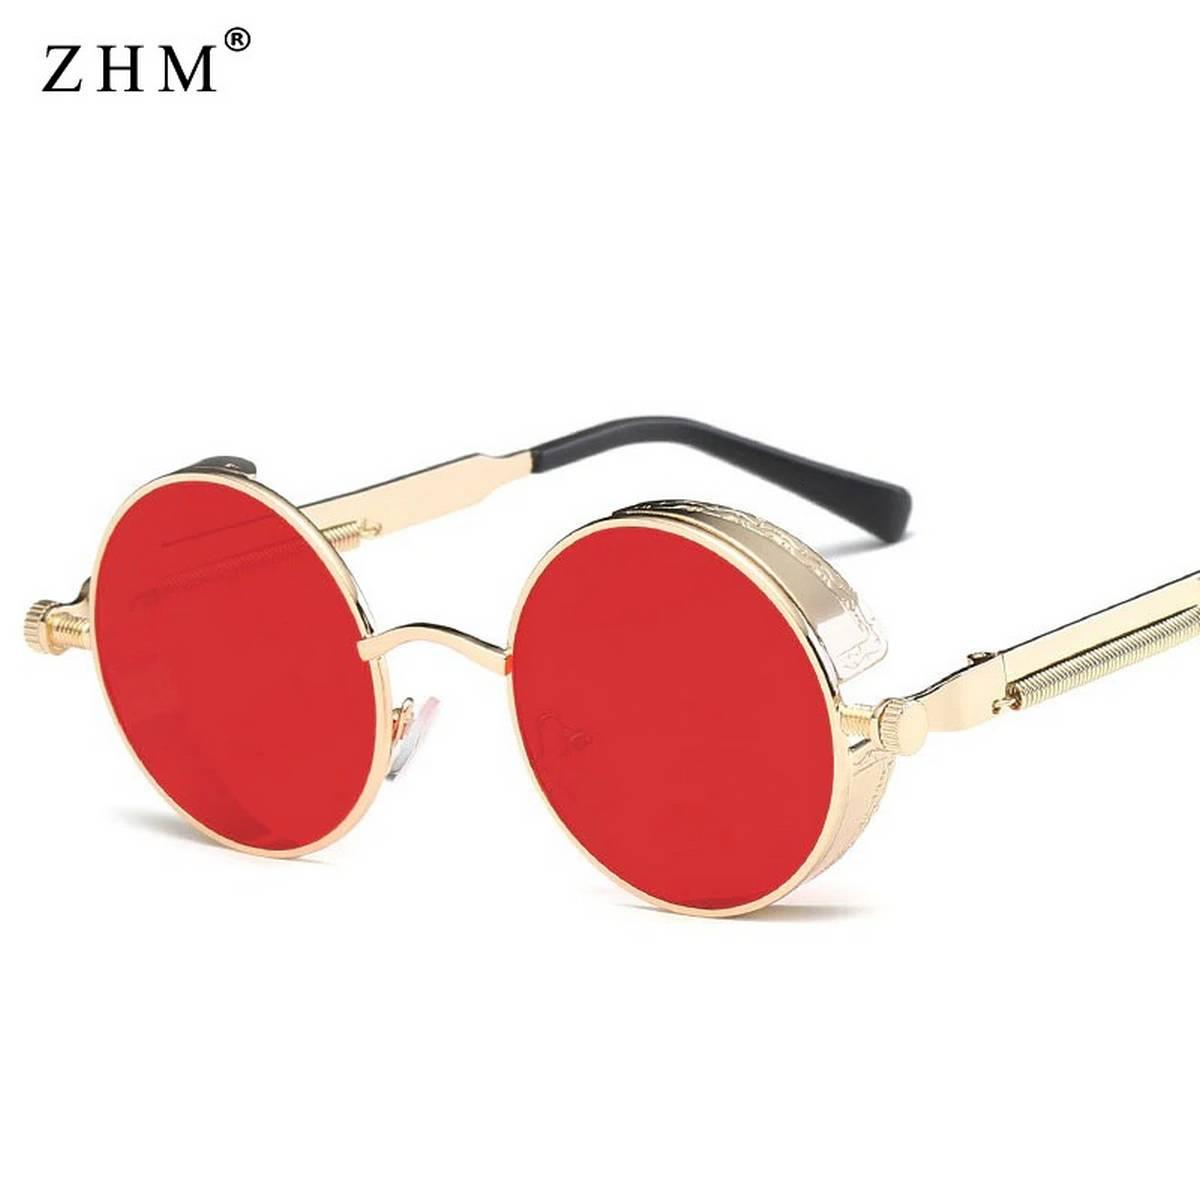 stylish mercury Sun Glasses Occident Fashion Colourful round Mercury Sunglasses trendy fashion 2020 Hot Sale glasses latest Fashion Glasses